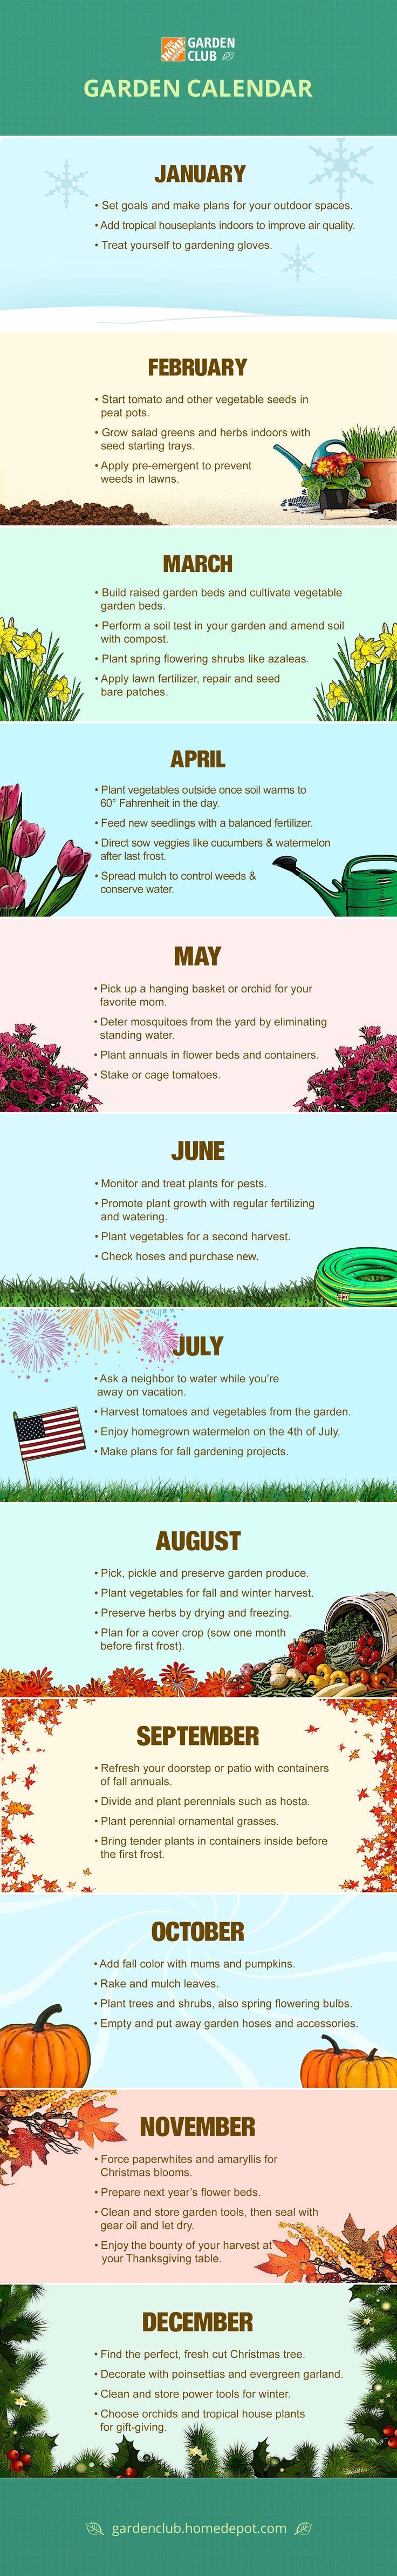 25 Best Ideas About Garden Club On Pinterest Clubbed